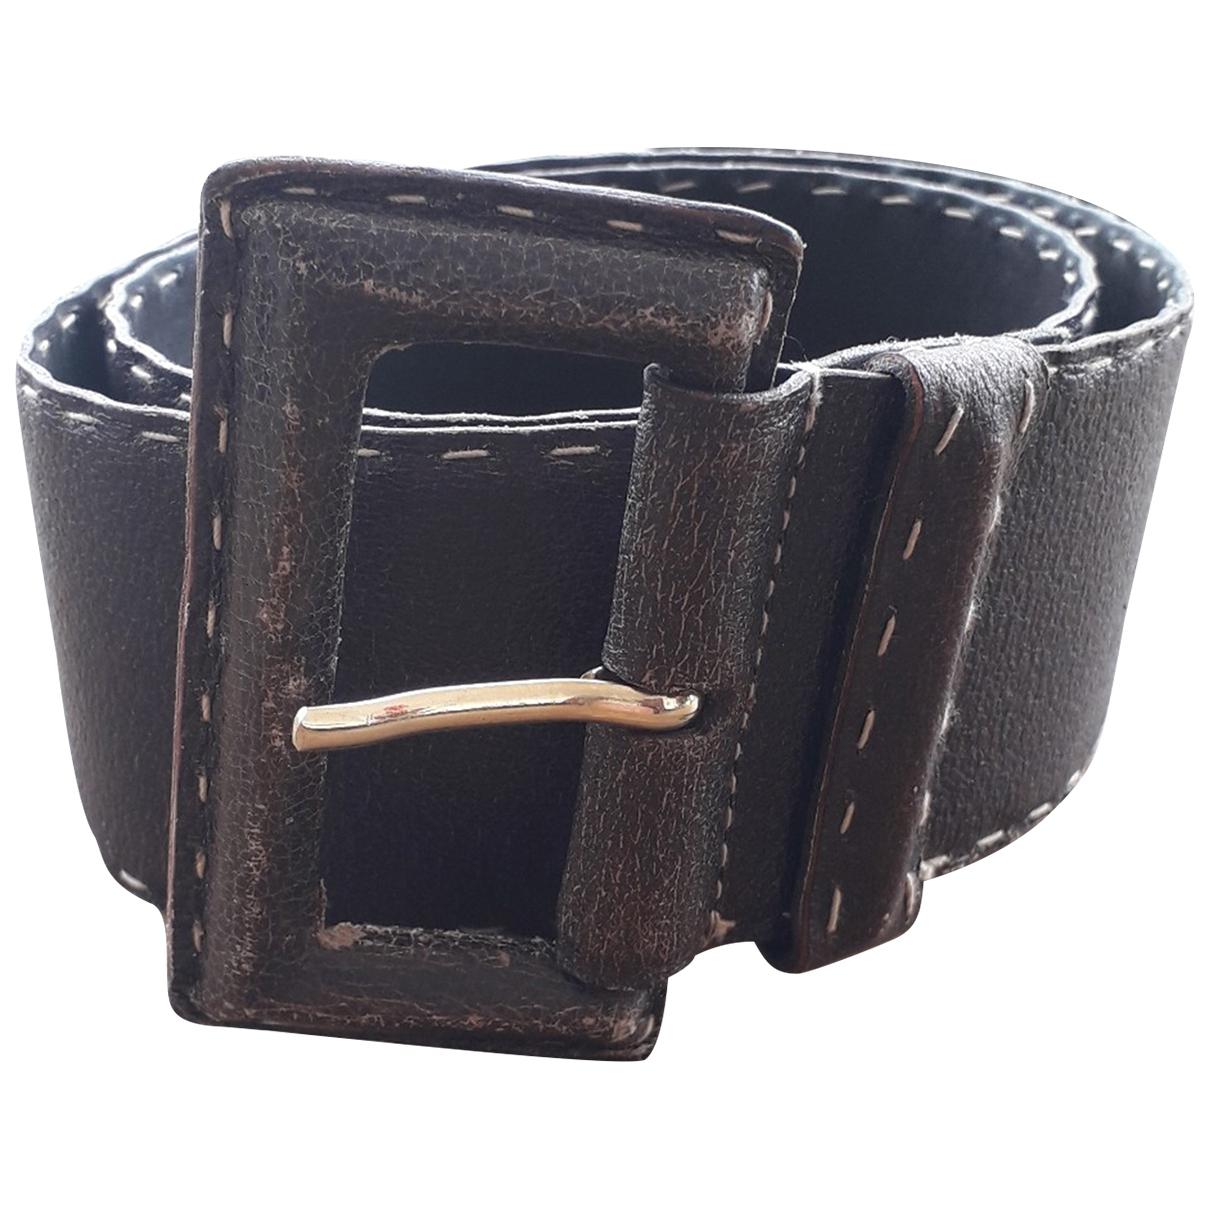 Max Mara \N Brown Leather belt for Women 95 cm